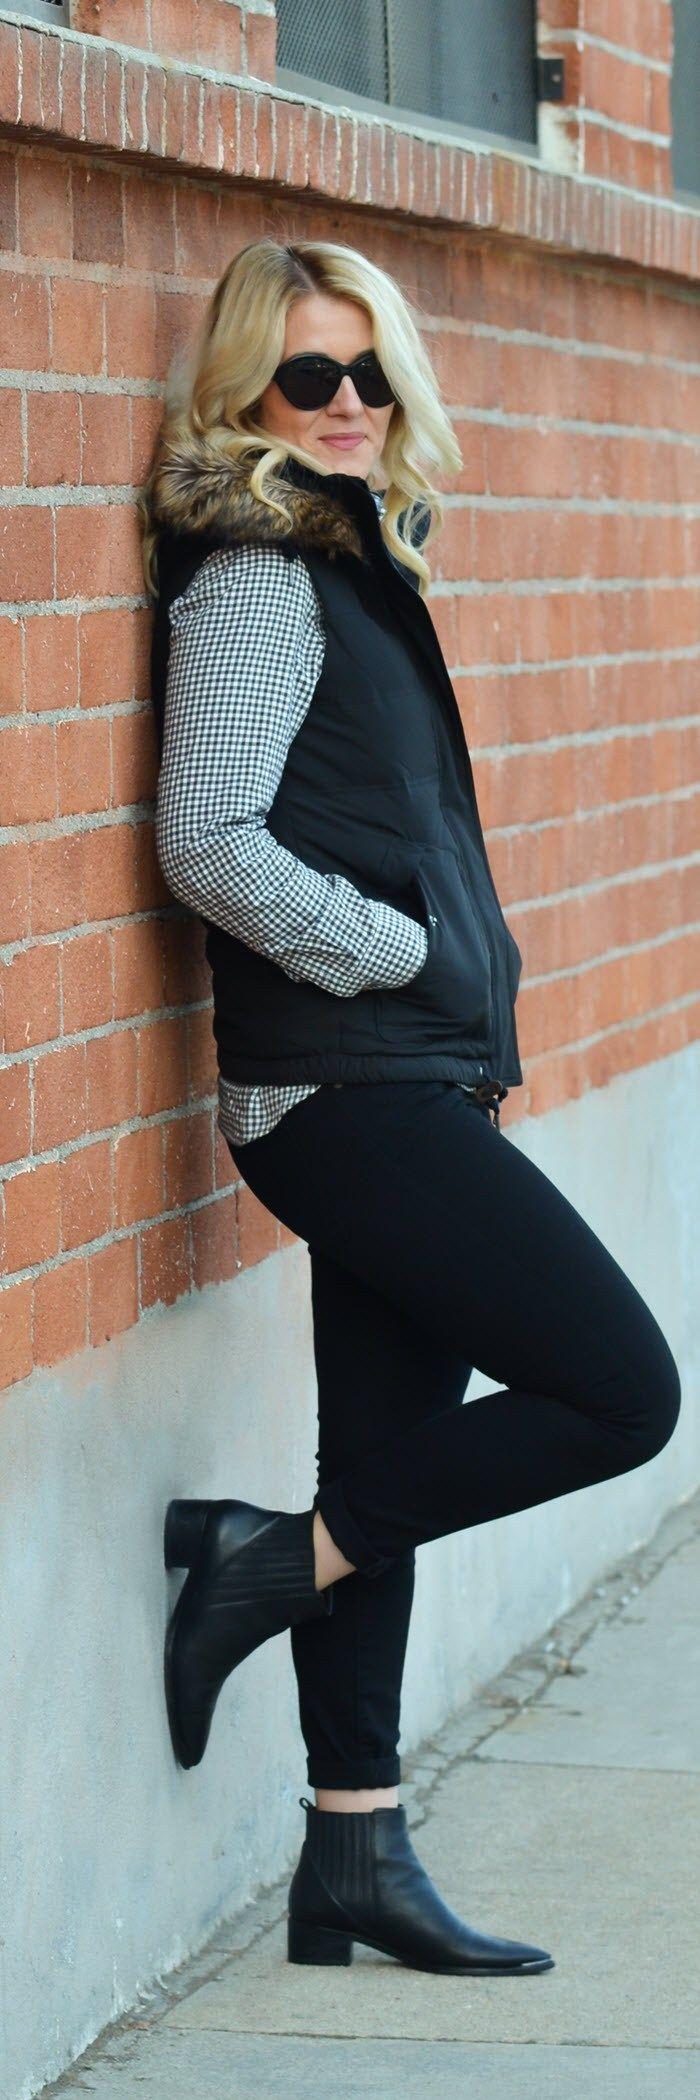 Fur Vest Outfit 2017 with Skinny Jeans #vest #fallfashion #furvest #fur #eddiebauer #currentelliott #marcfisher #booties #ankleboots #lablogger #fashionblog #fashionblogger #flannel #blackandwhite #fashionstyle #outfitideas #womensfashion #womenover30